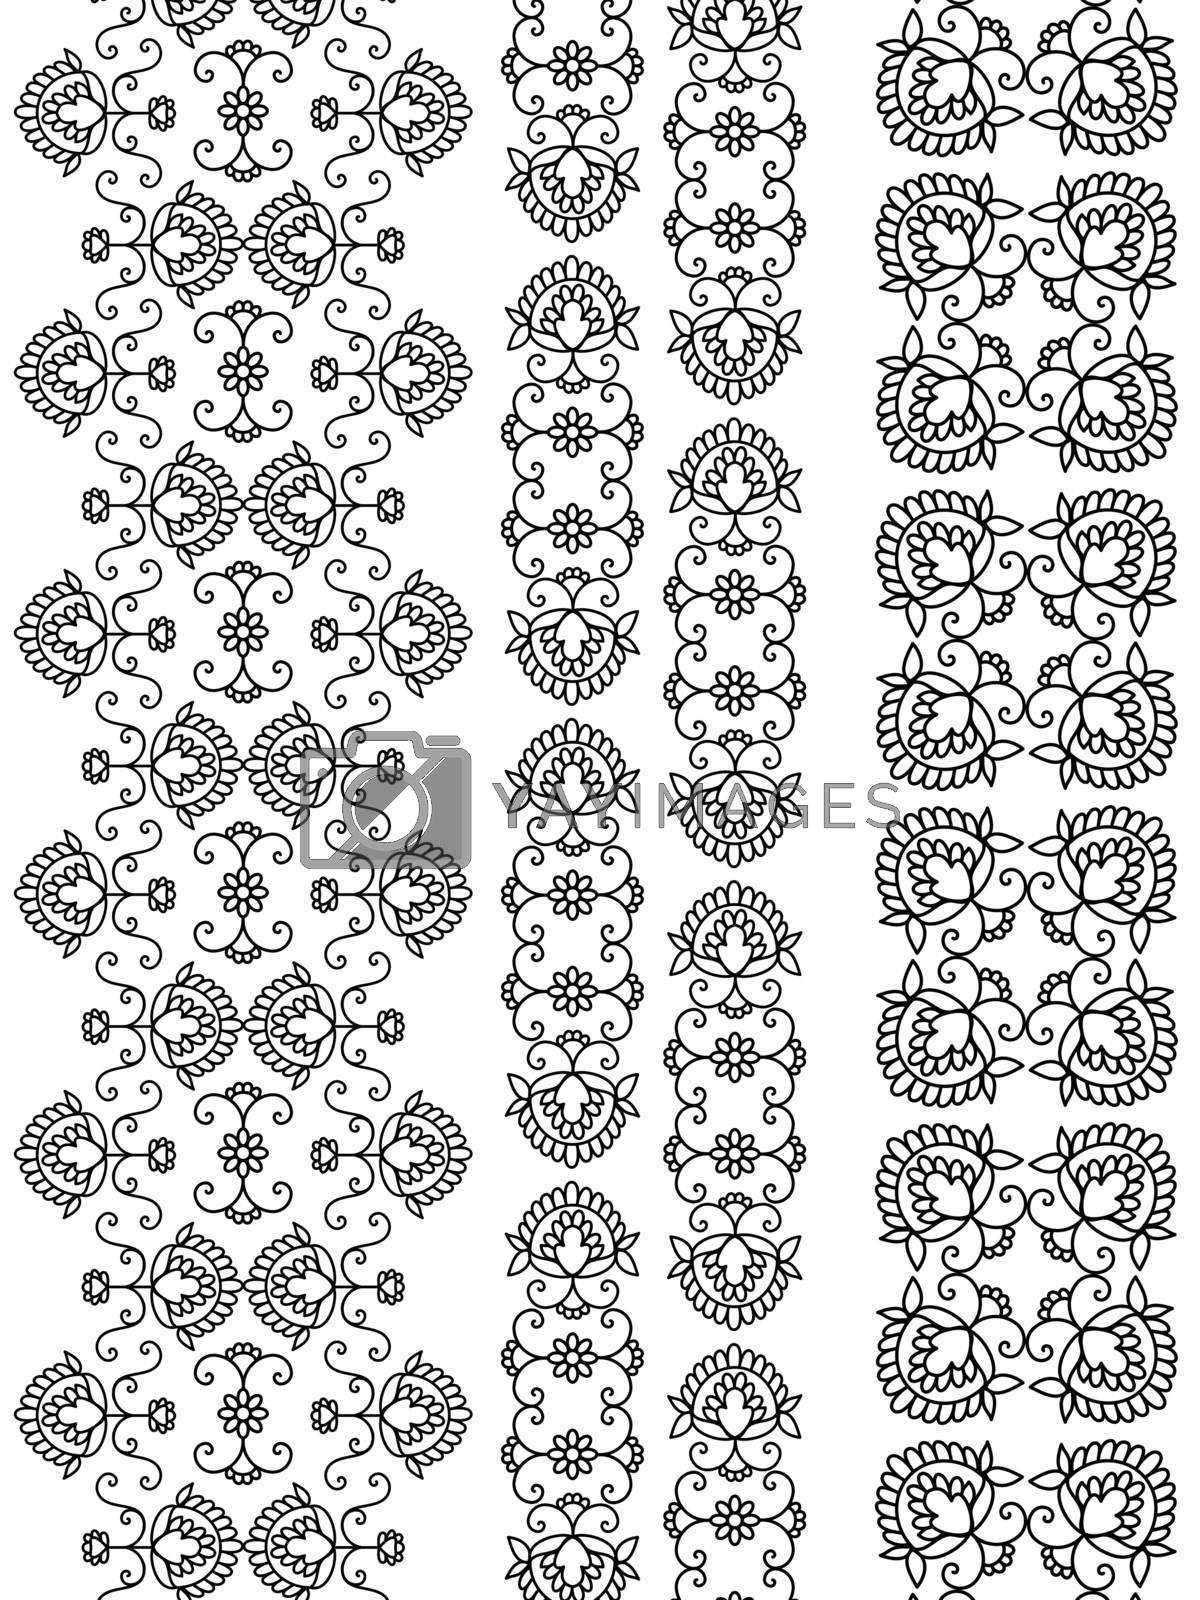 Detailed Henna art Inspired Border designs, elaborate and easily editable.